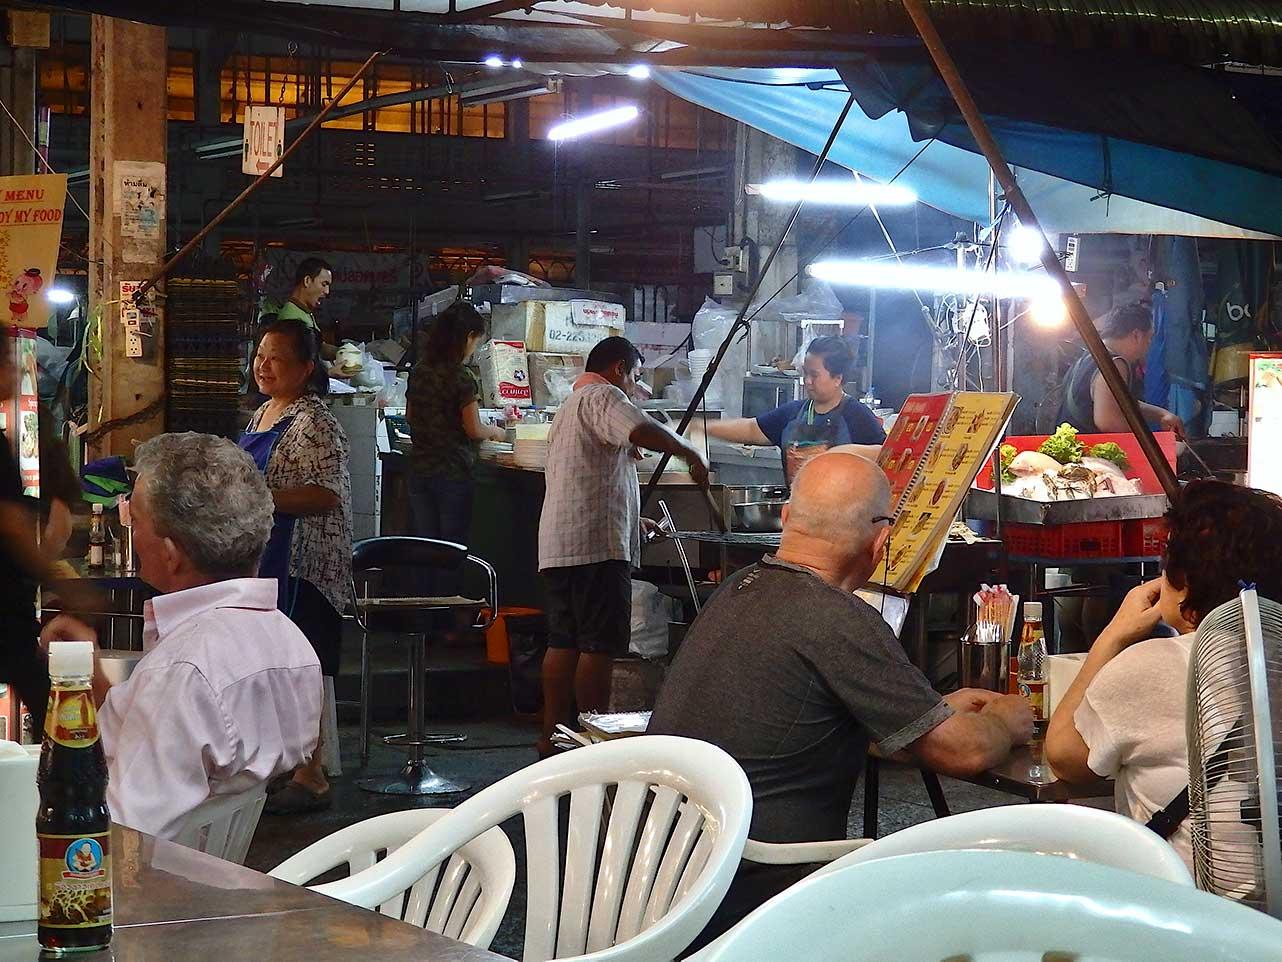 Garküchen in Chinatown, Bangkok